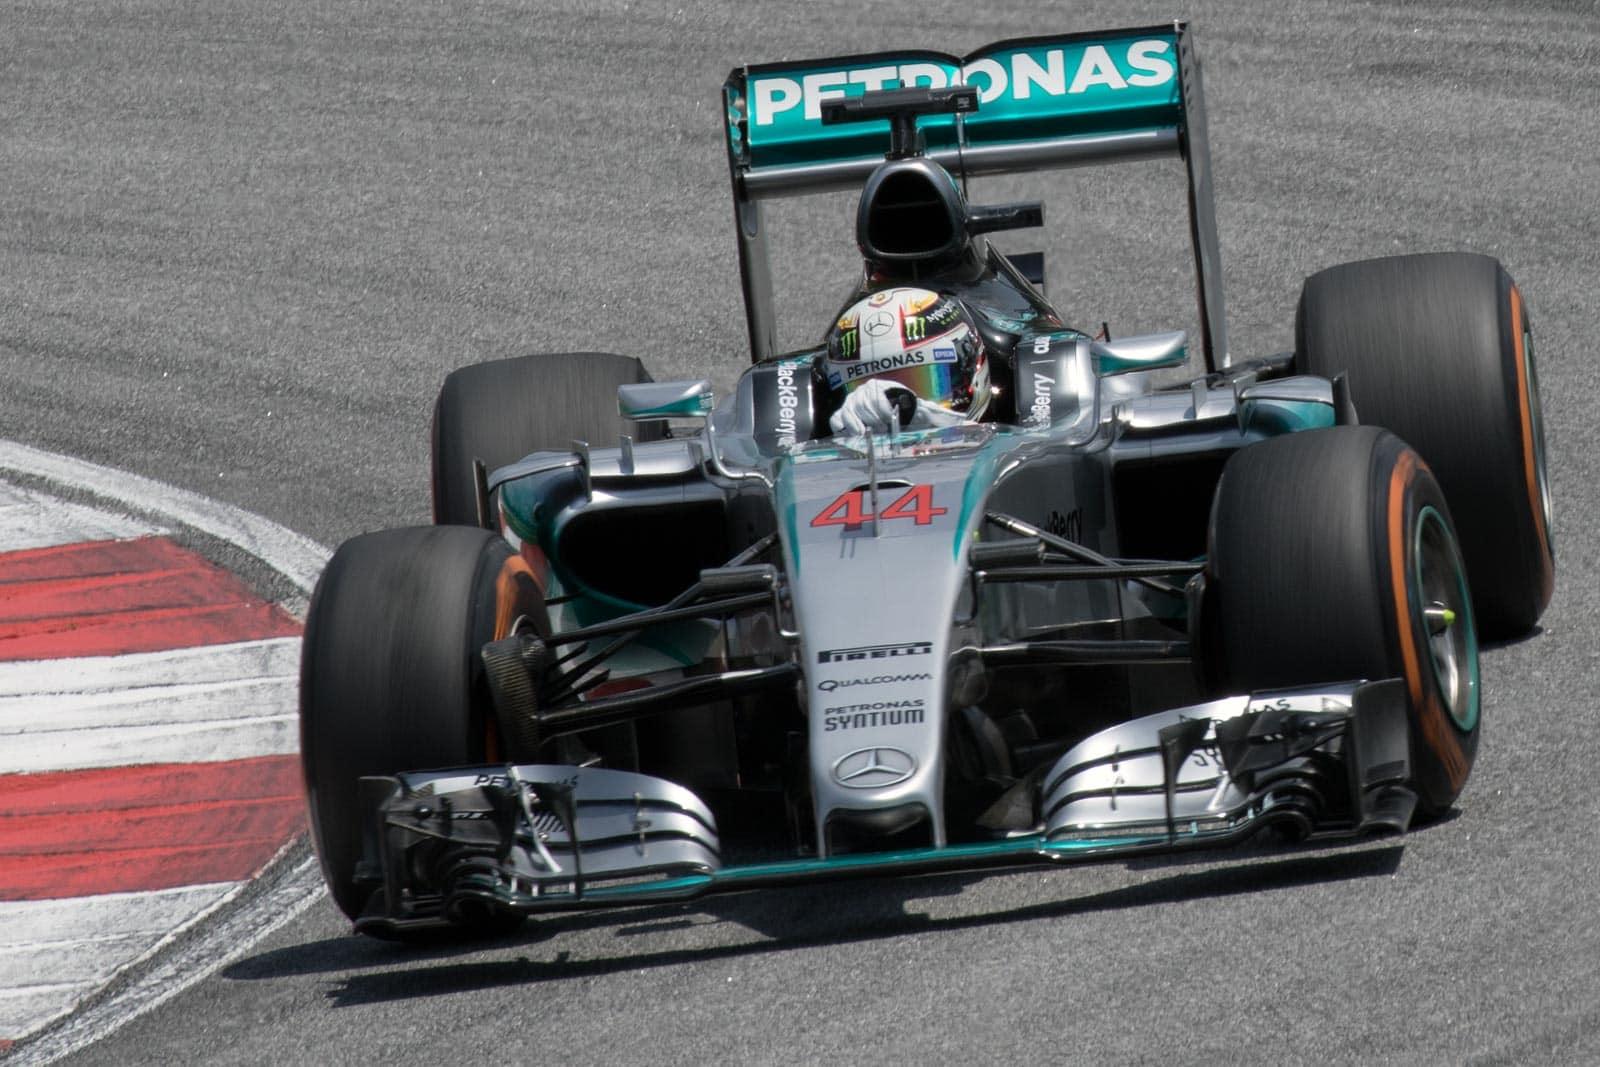 Lewis Hamilton's Mercedes F1 car